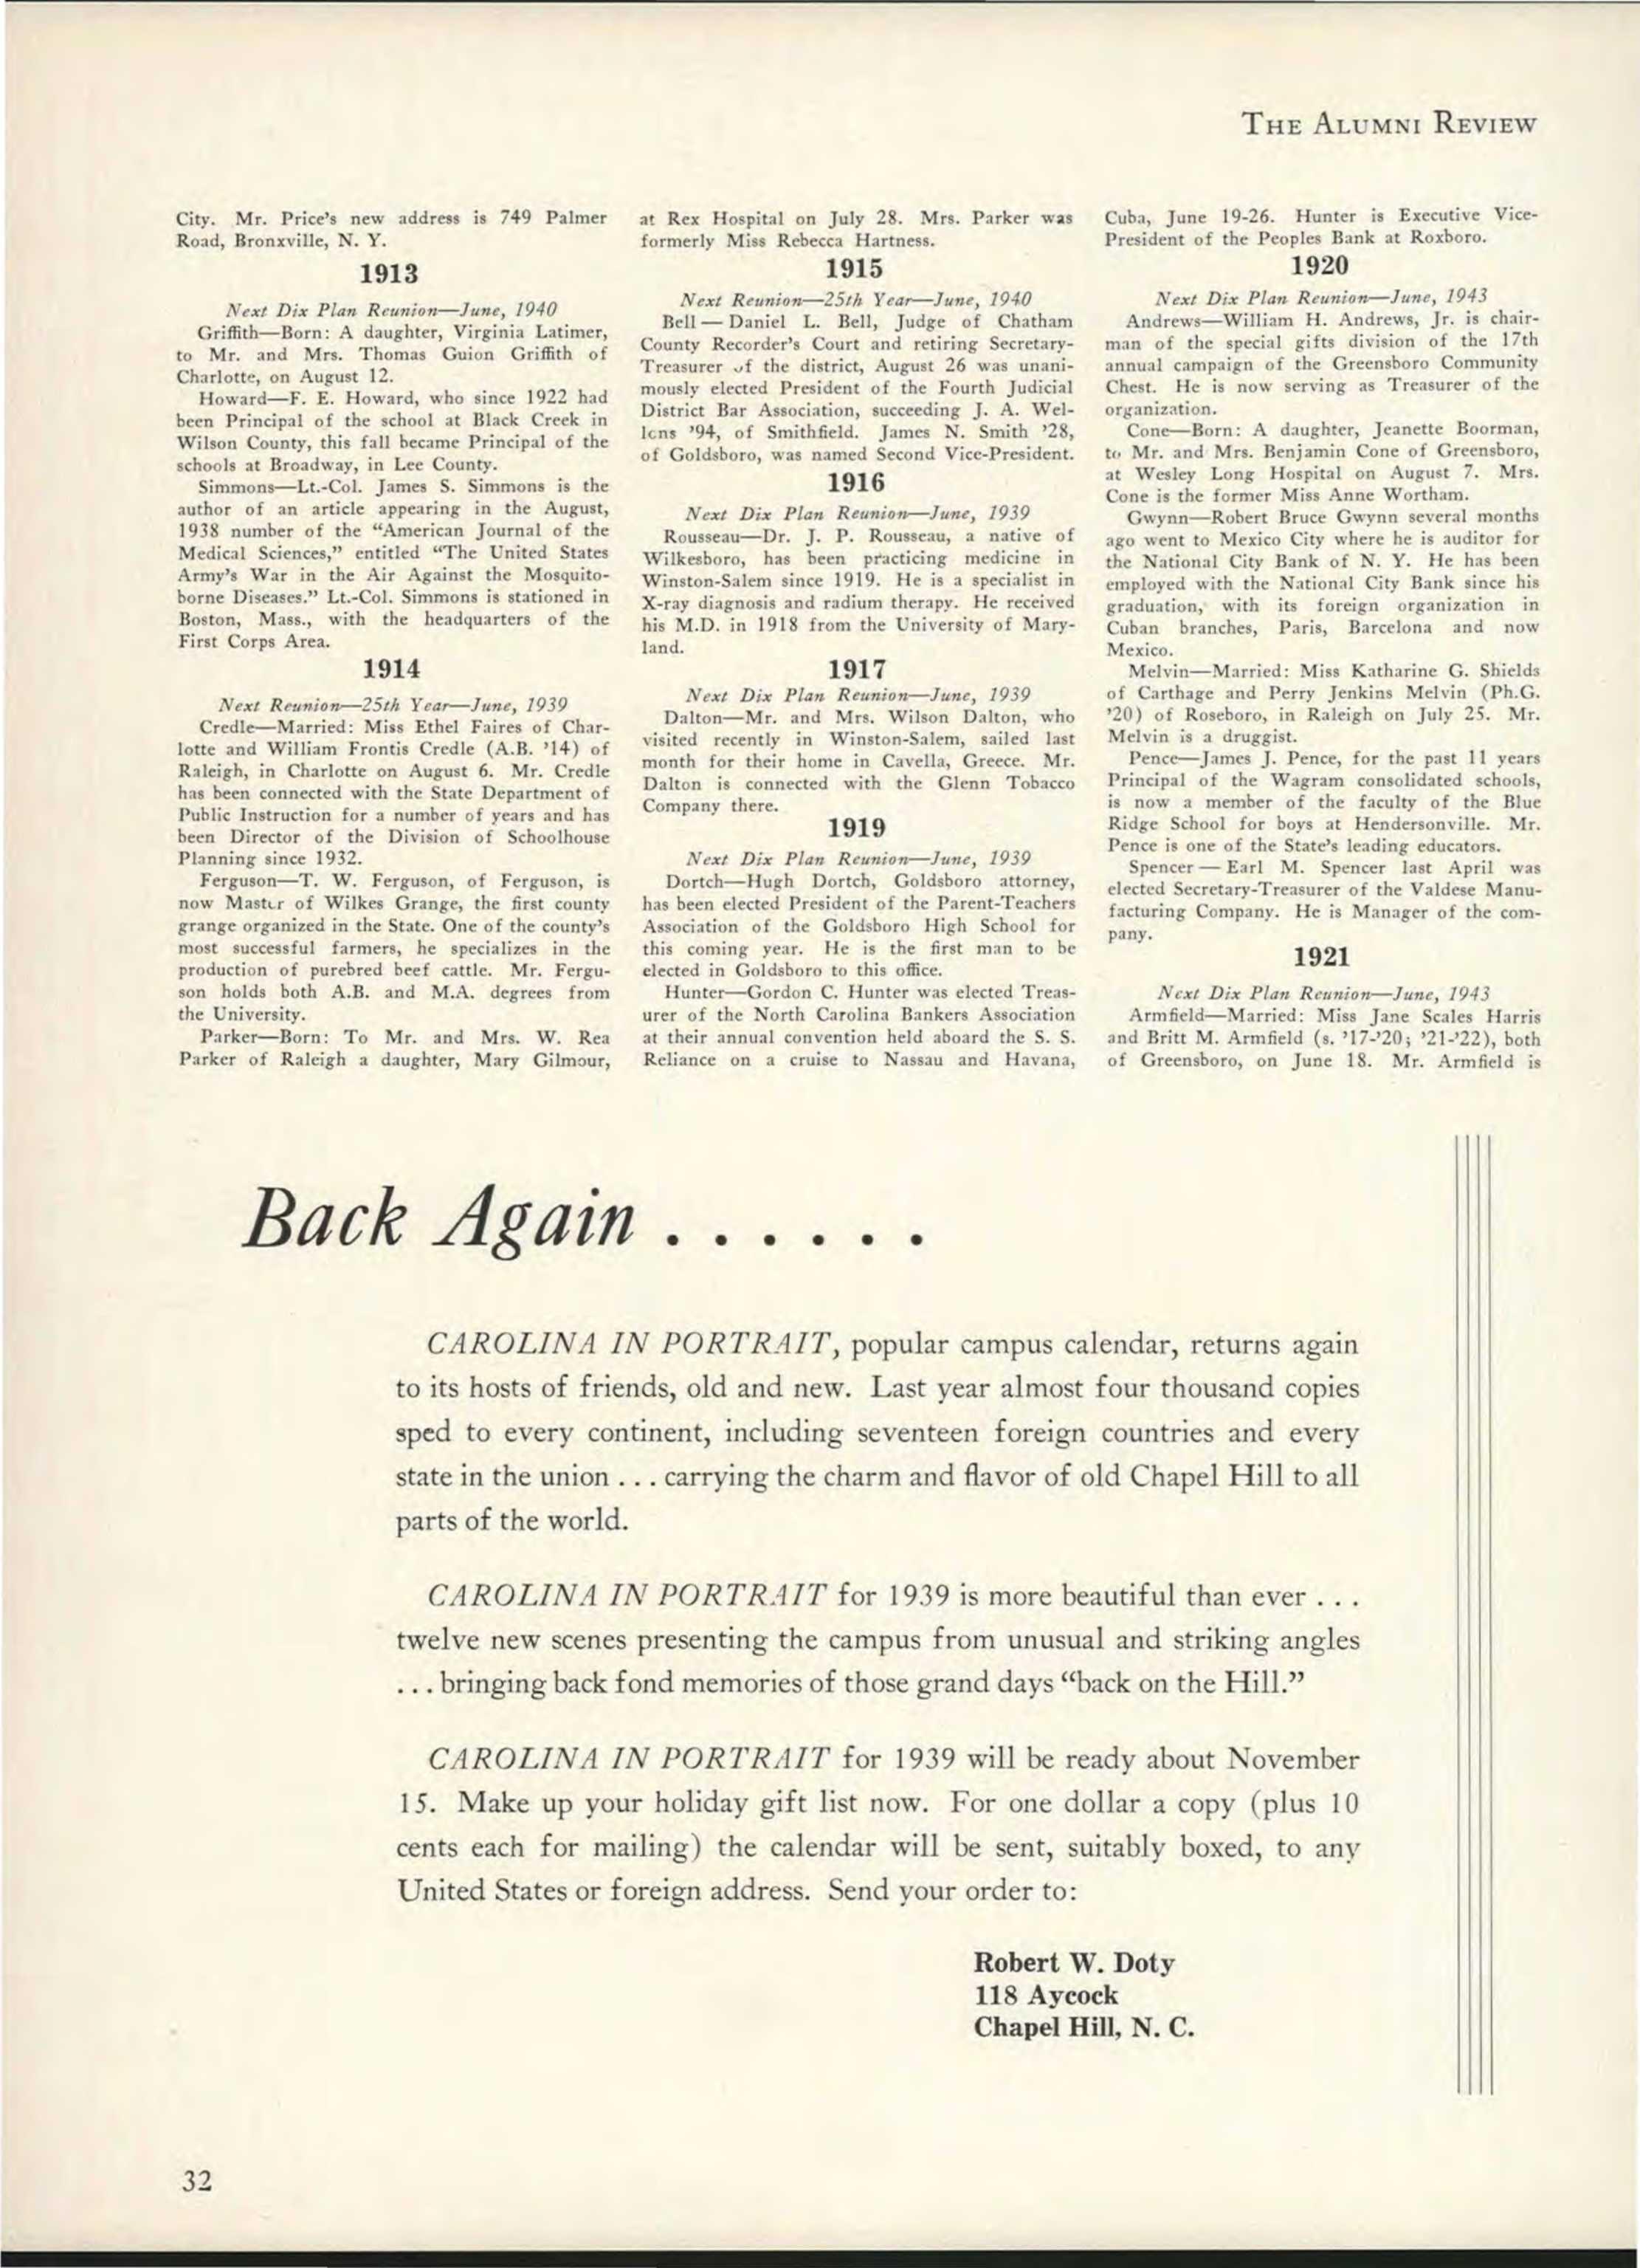 Carolina Alumni Review - October 1938 - page 33